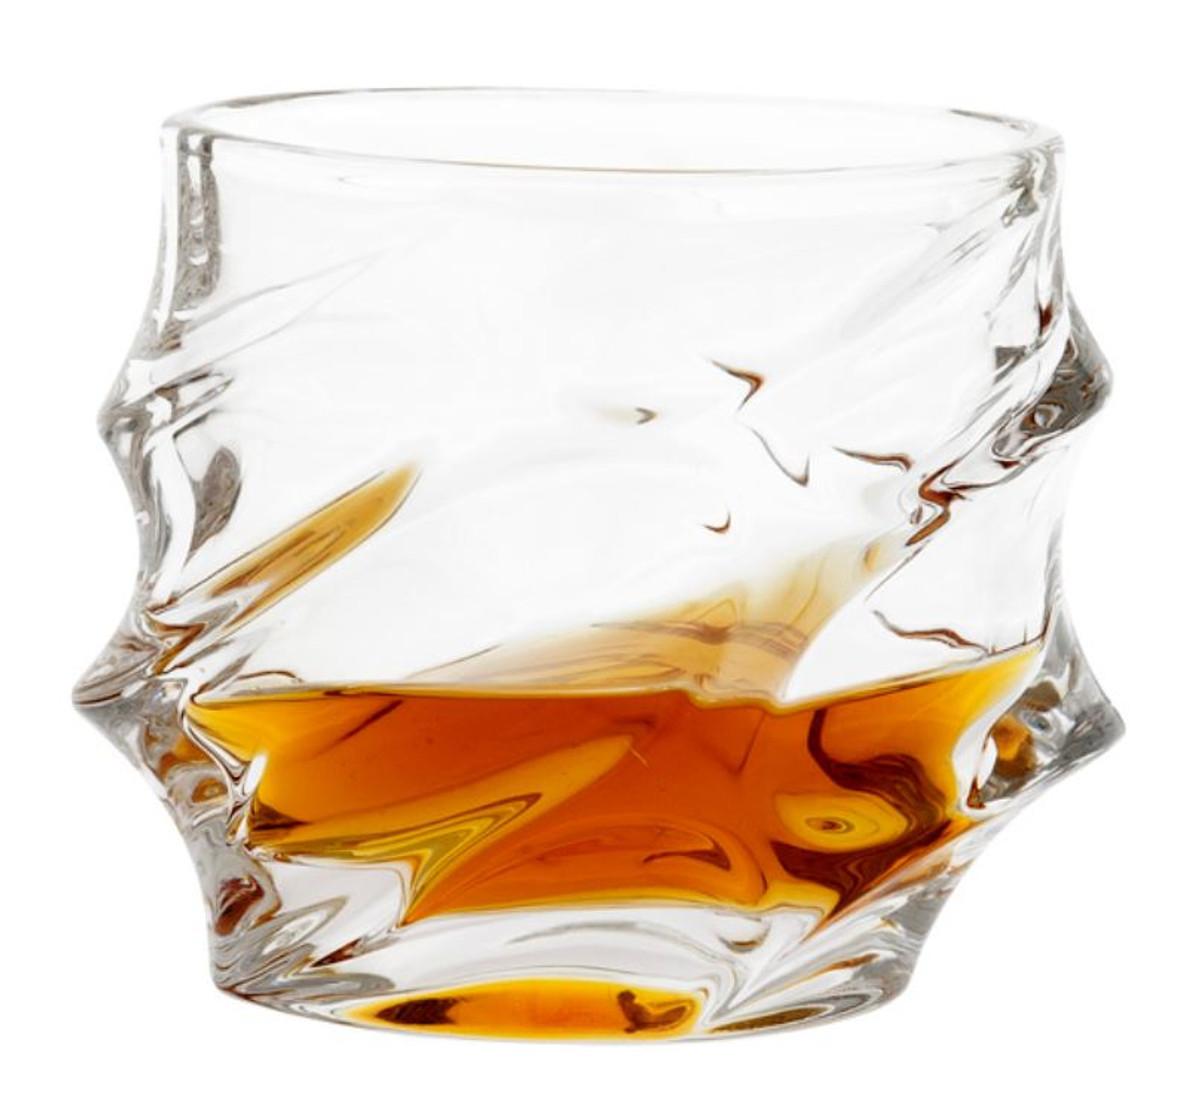 casa padrino crystal glass whiskey cognac set luxury hotel restaurant accessories. Black Bedroom Furniture Sets. Home Design Ideas